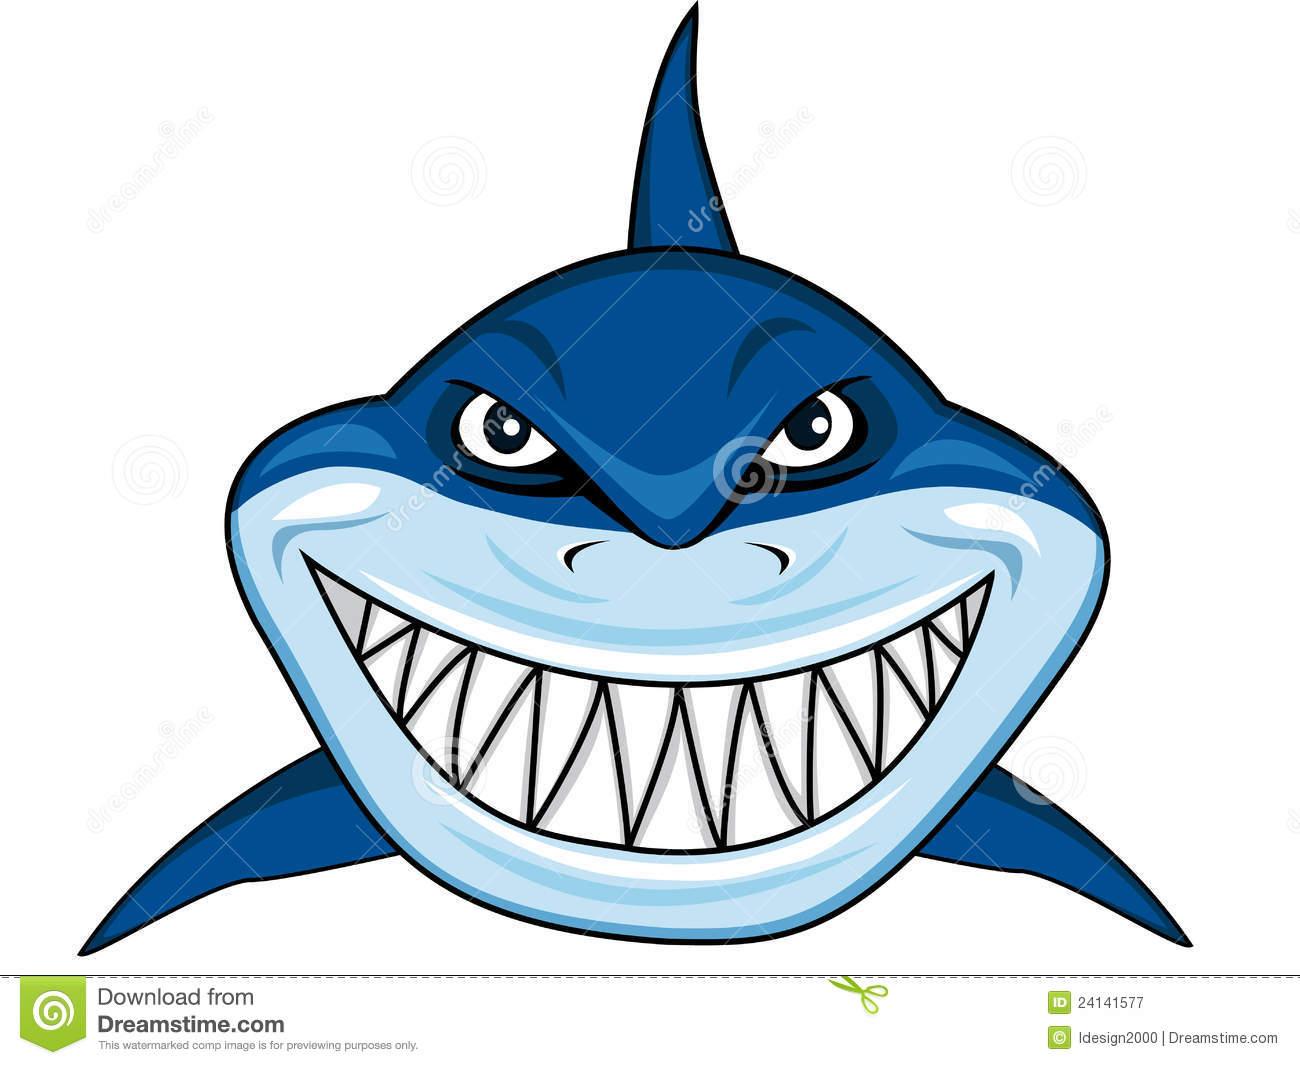 Fins clipart shark head Images Shark Fin Illustration Clipart